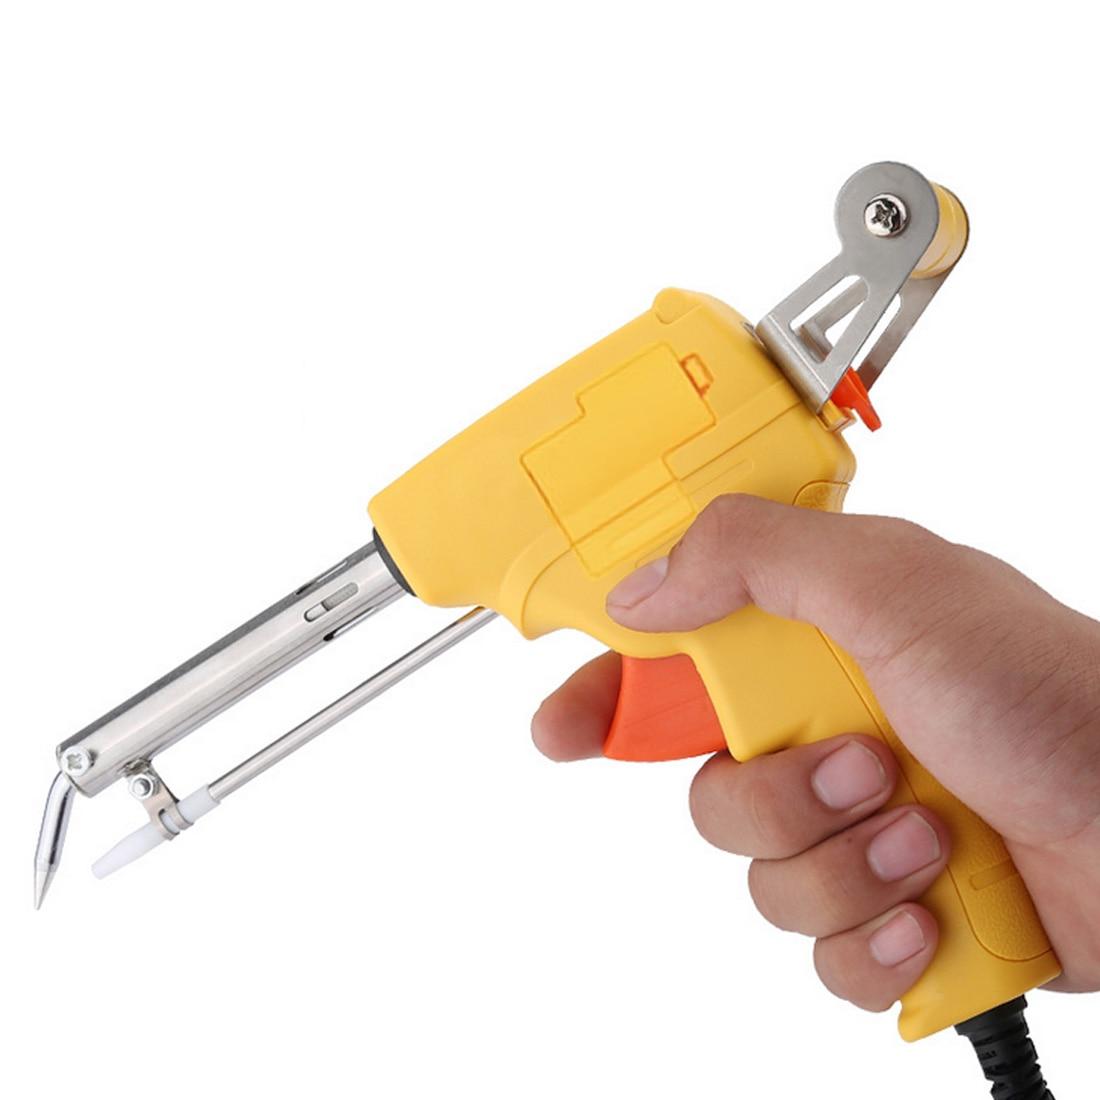 Ac220v 60w estanho ferro de solda kit automático enviar pistola lata ferros solda elétrica otário ferramenta de solda